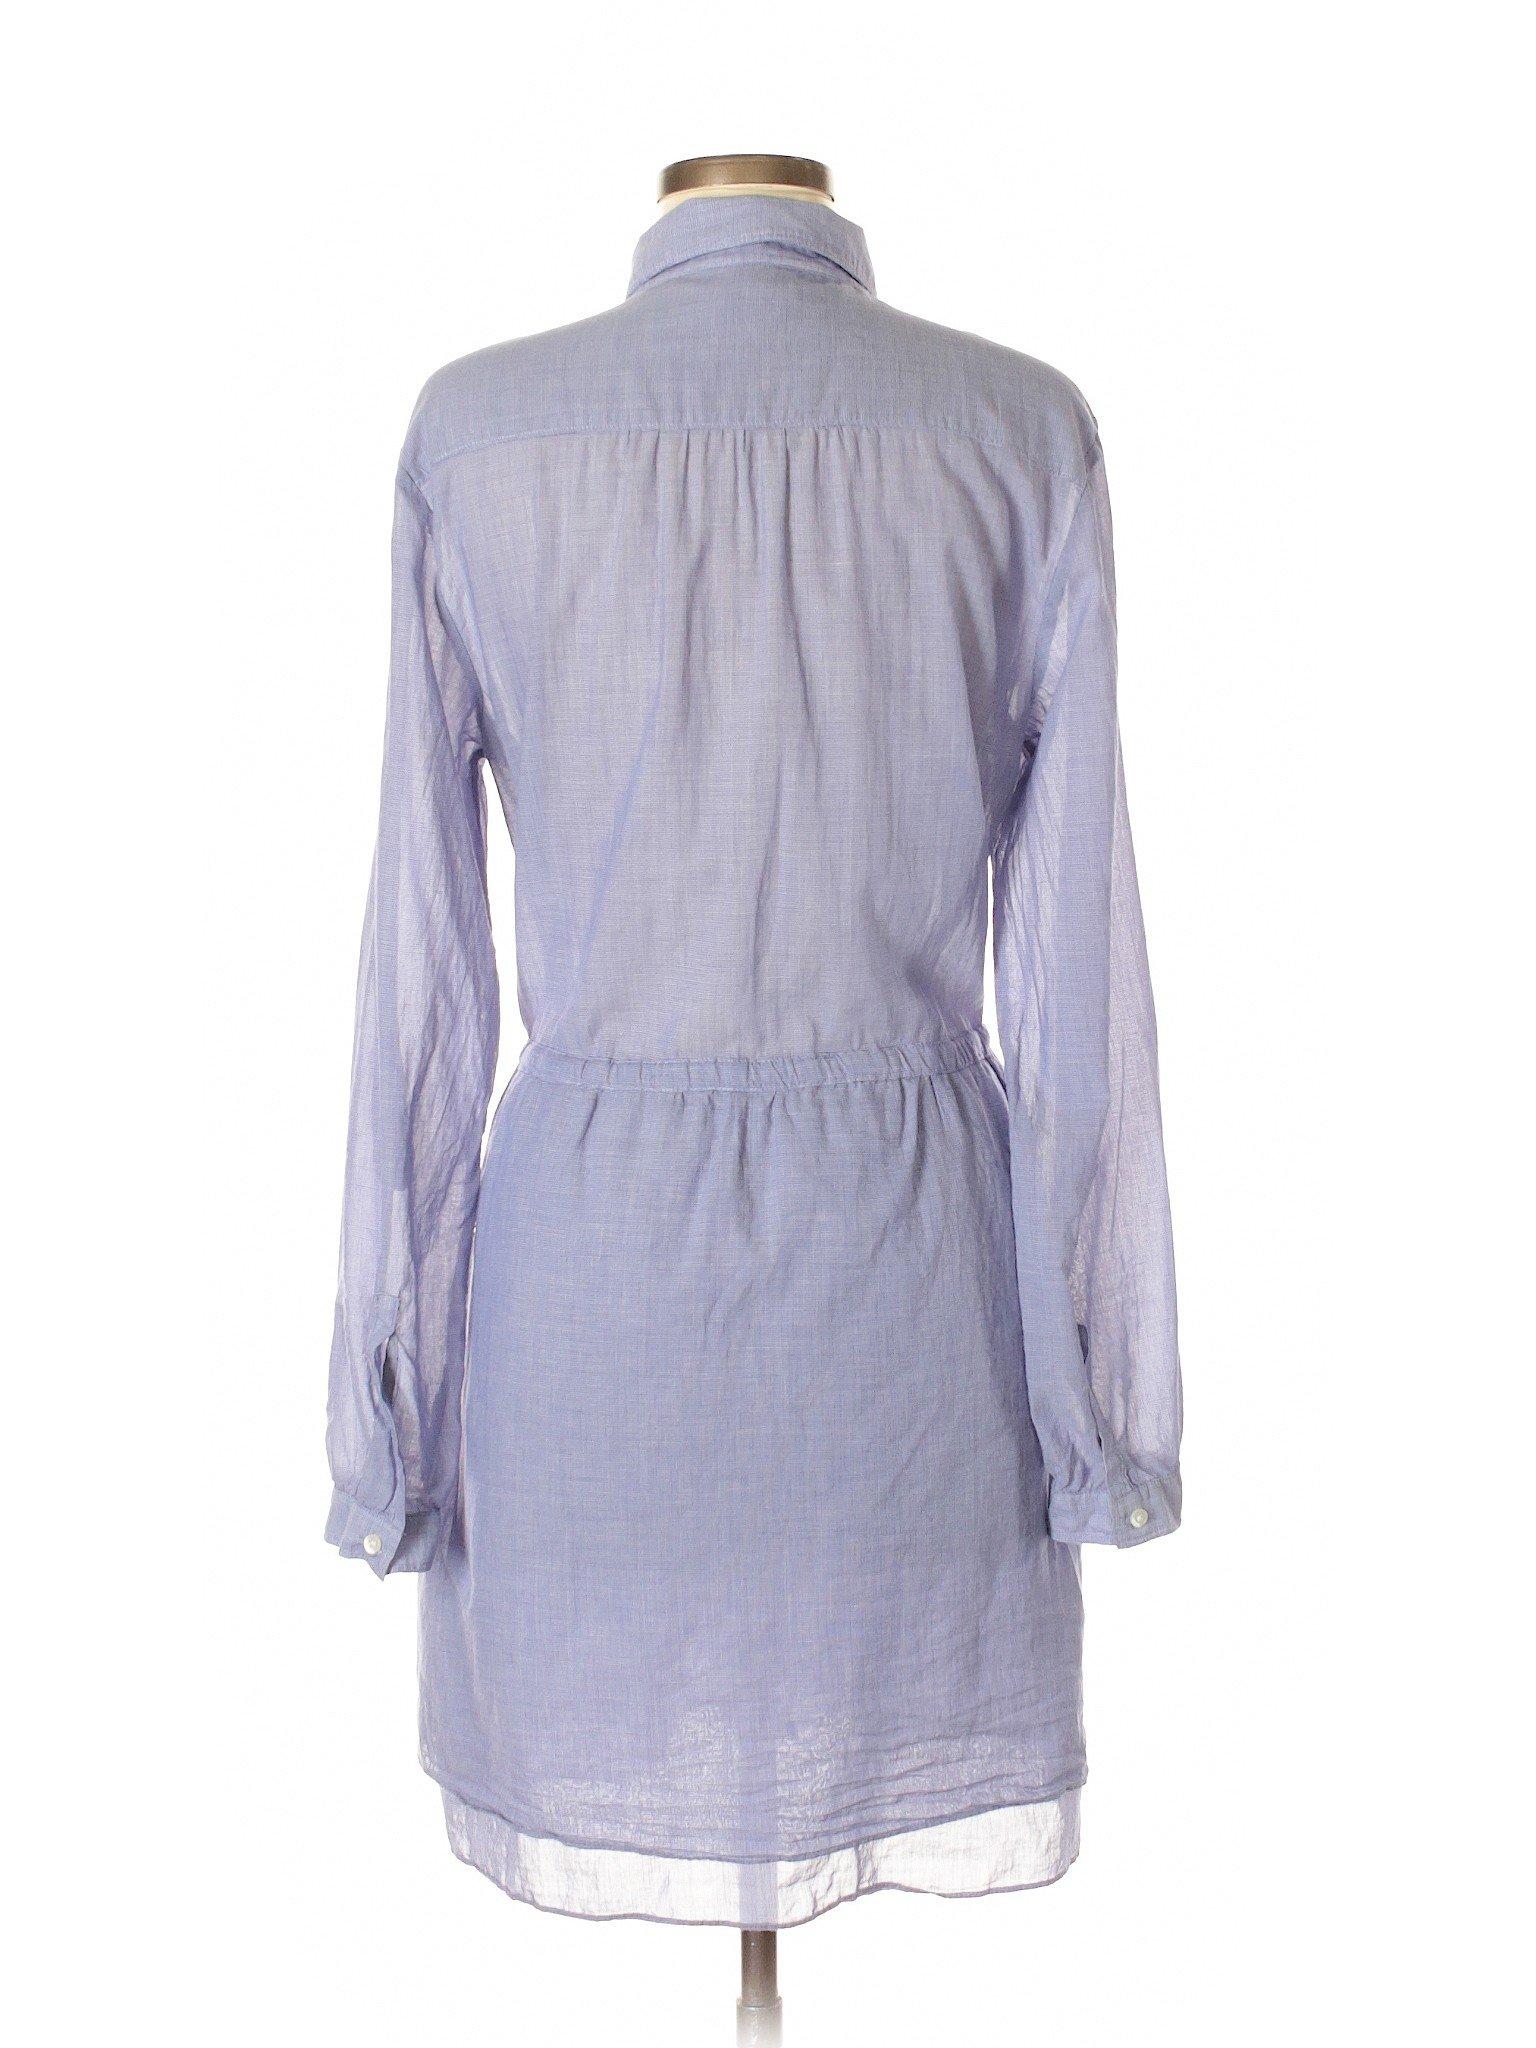 Casual Boutique Gap Dress winter Boutique winter wOIqxdzz